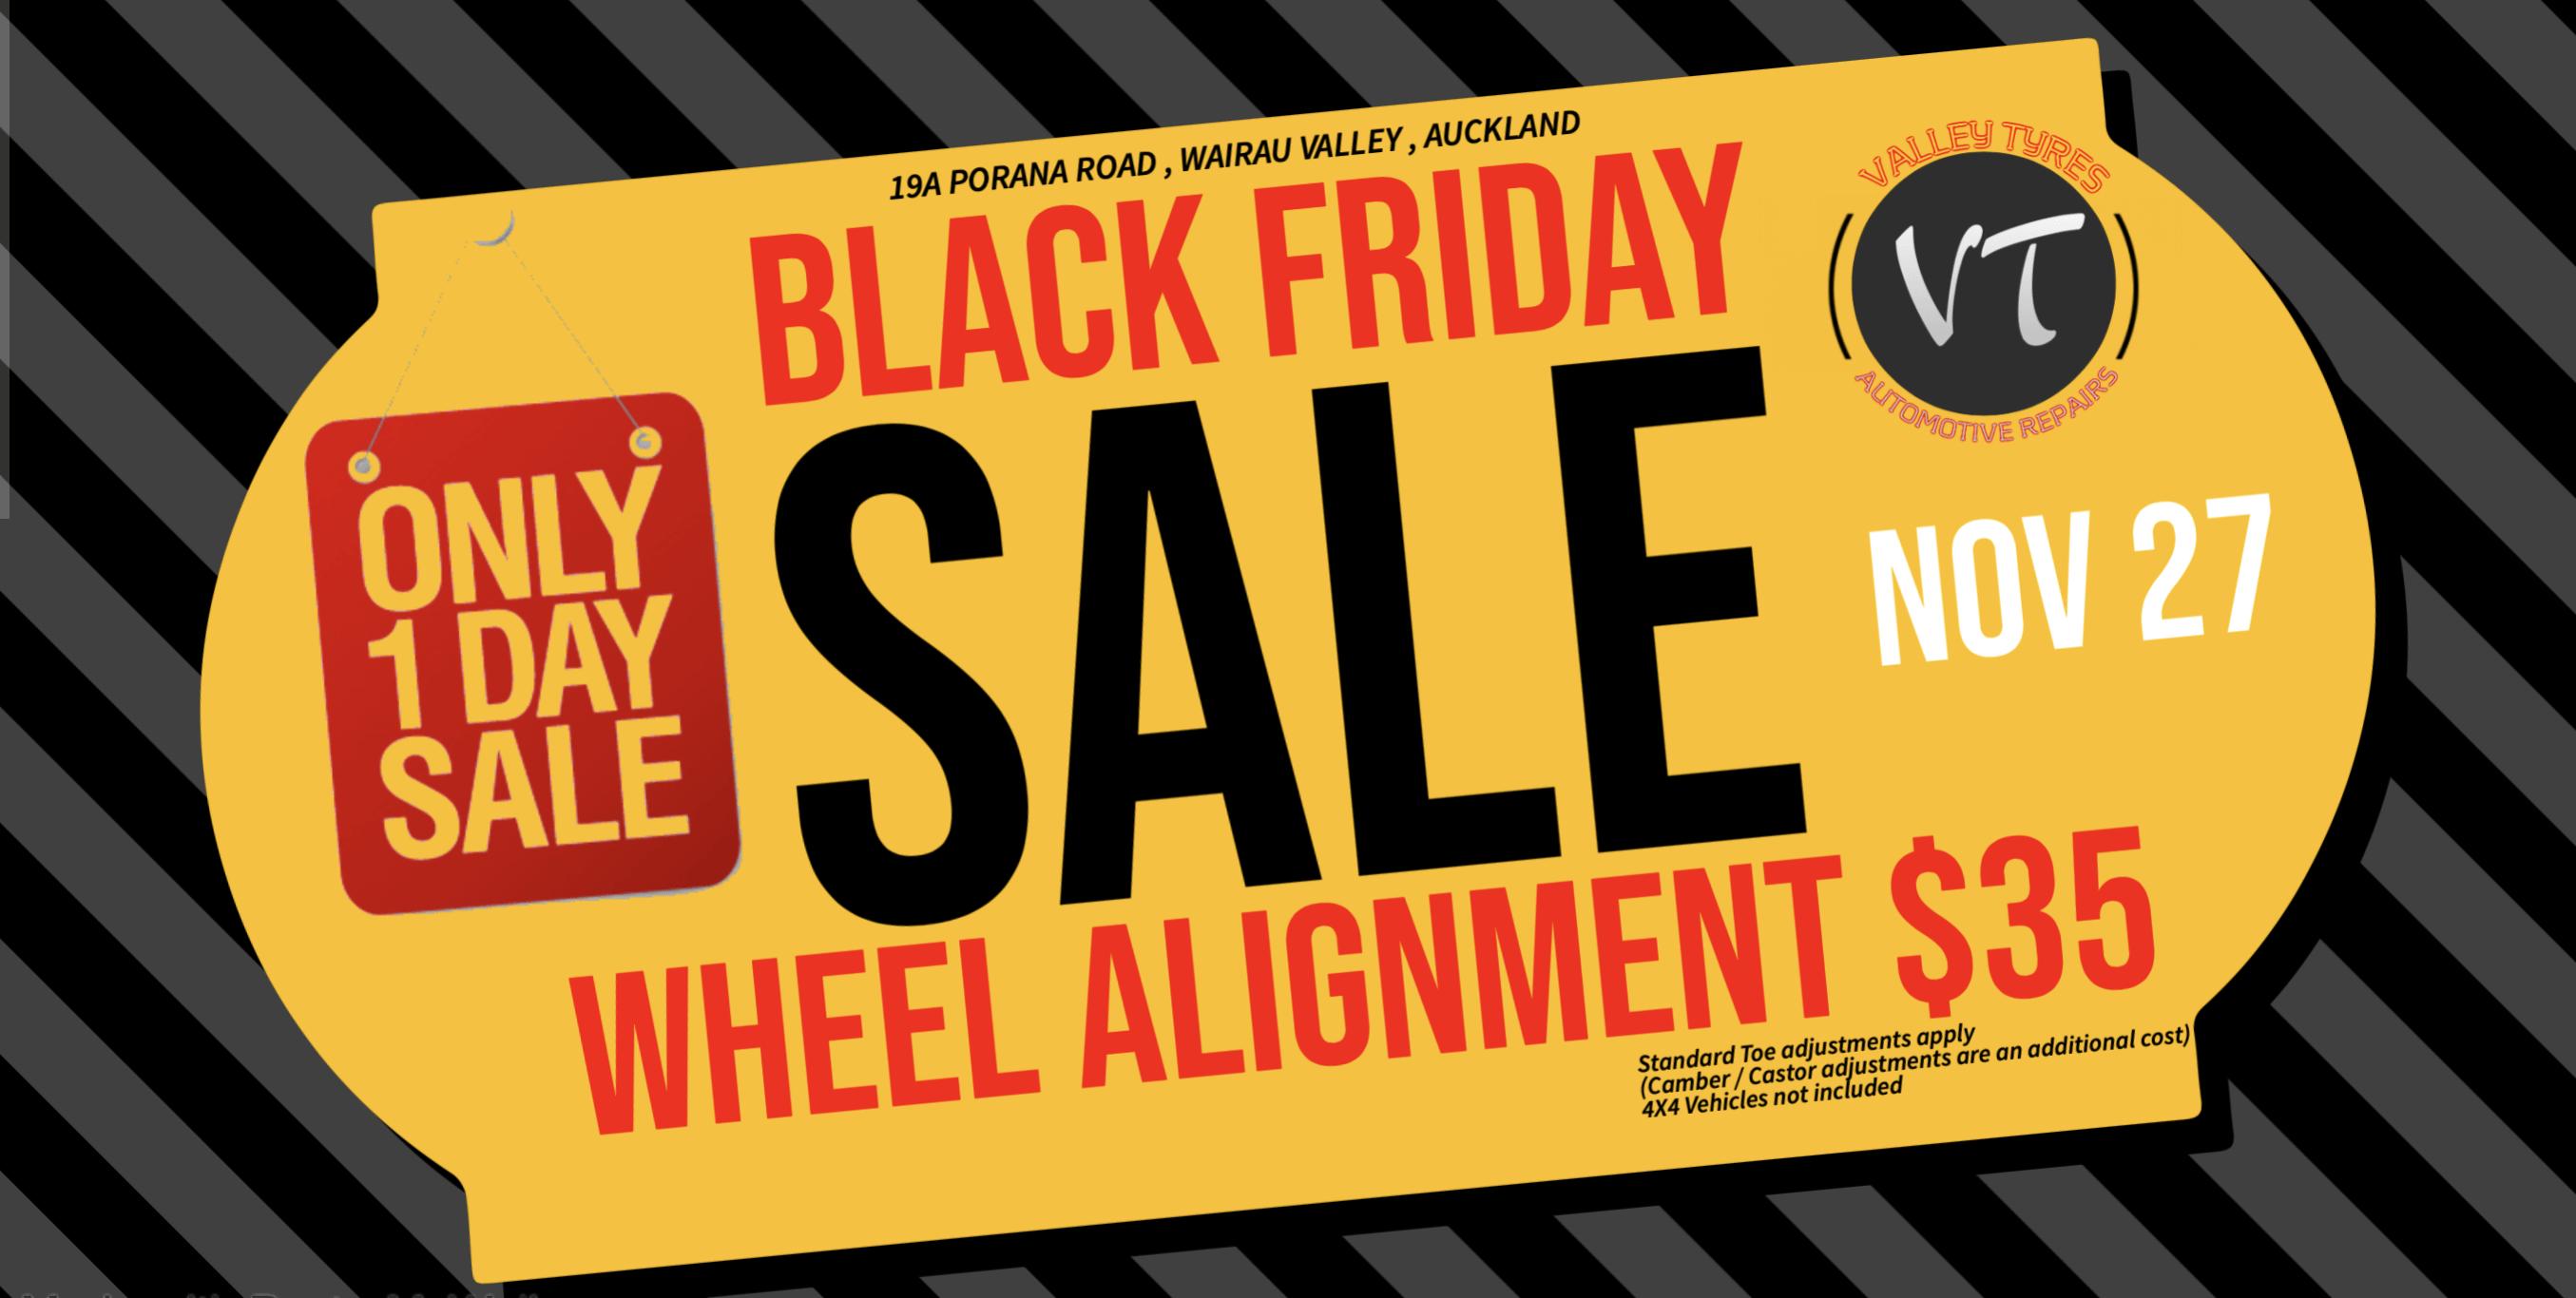 Black Friday Valley Tyres Wheel alignment